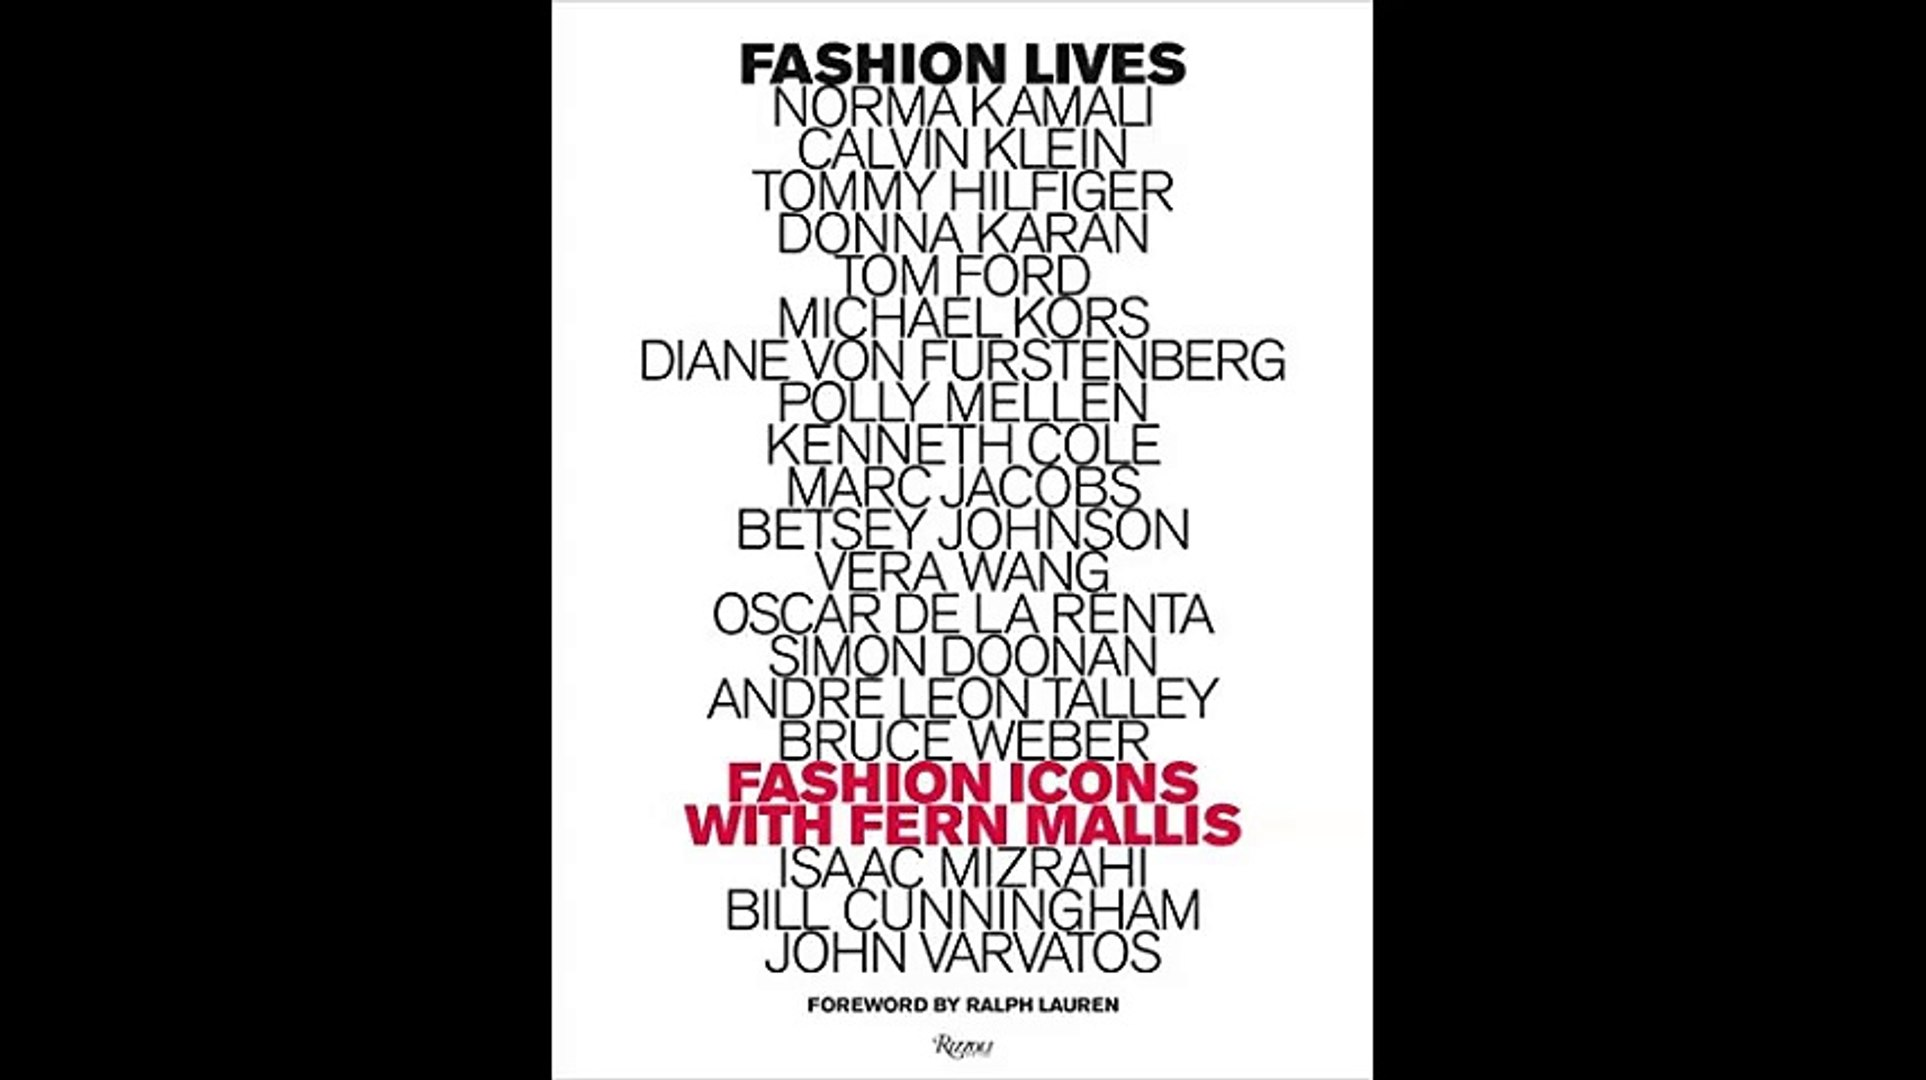 Fashion Lives Fashion Icons with Fern Mallis